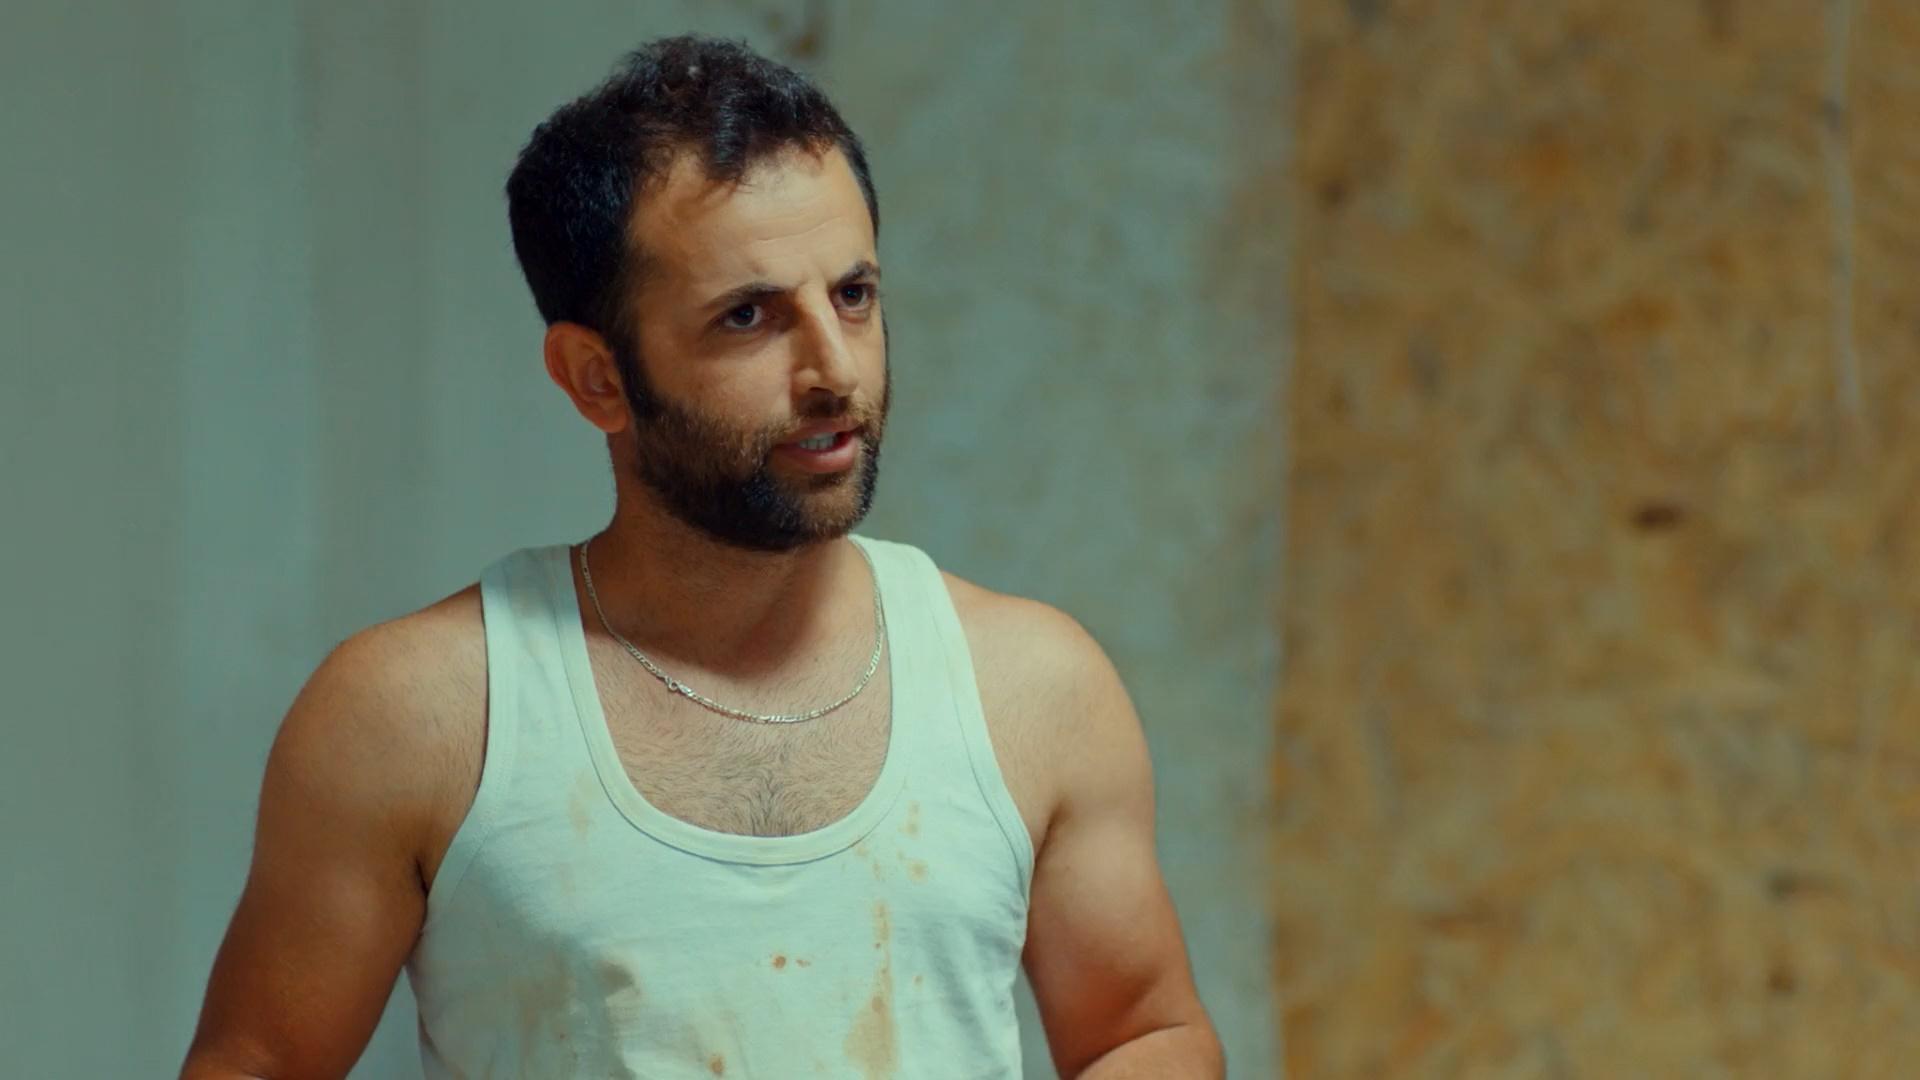 Dümdüzz Adam | 2018 | Yerli Film | NF | WEB-DL | XviD | Sansürsüz | 720p - 1080p - m720p - m1080p | WEB-DL | Tek Link